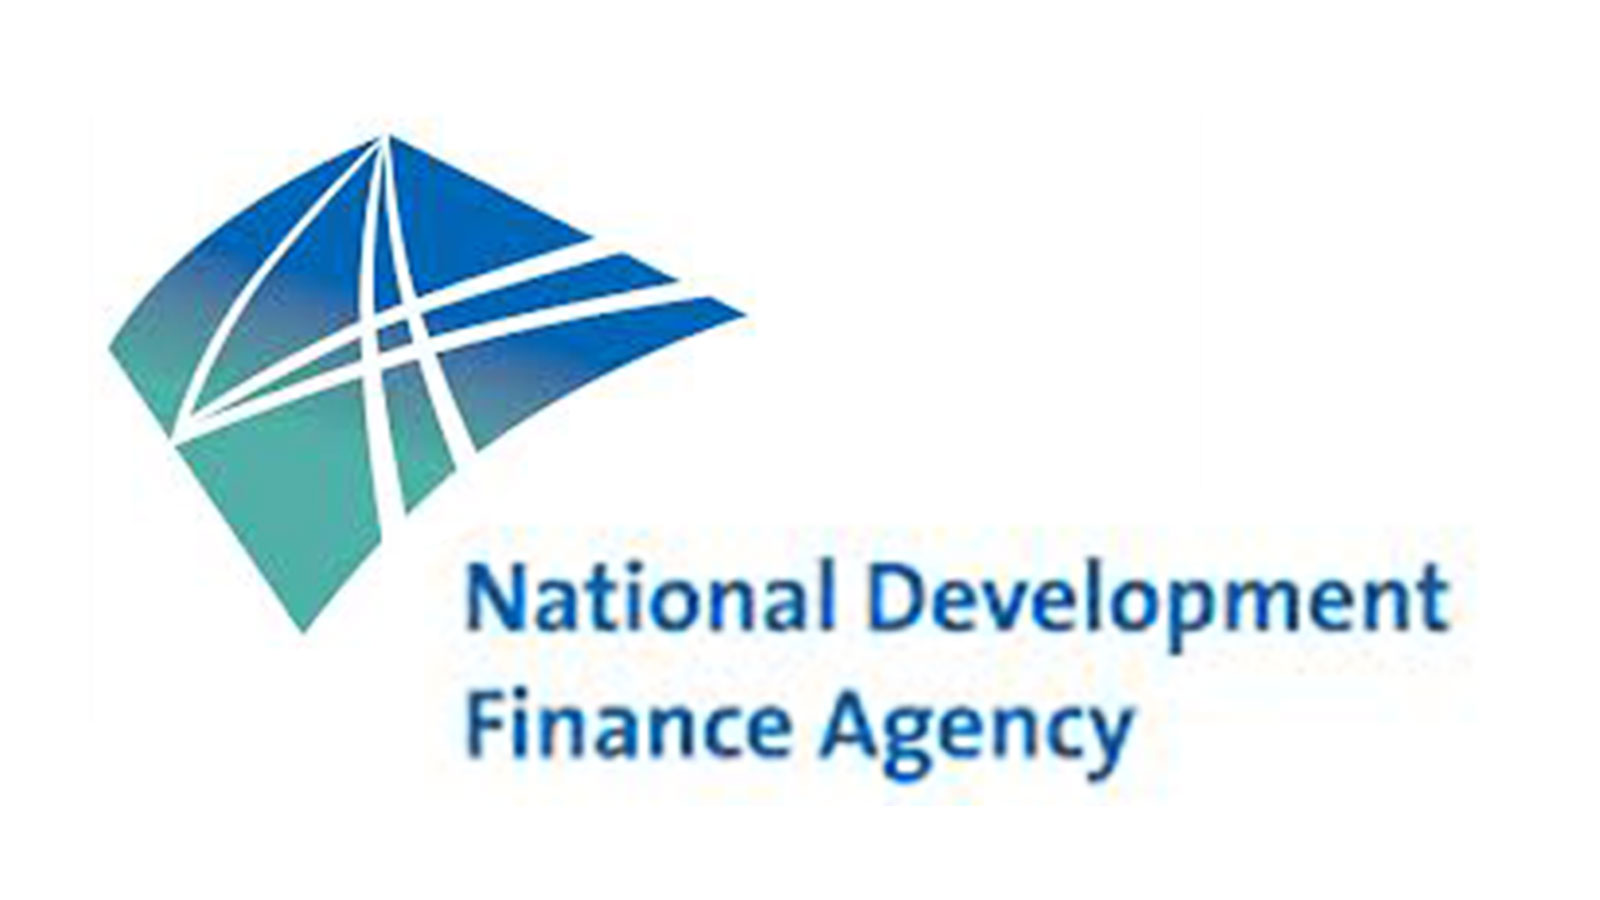 Ireland NDFA Choose Asite.